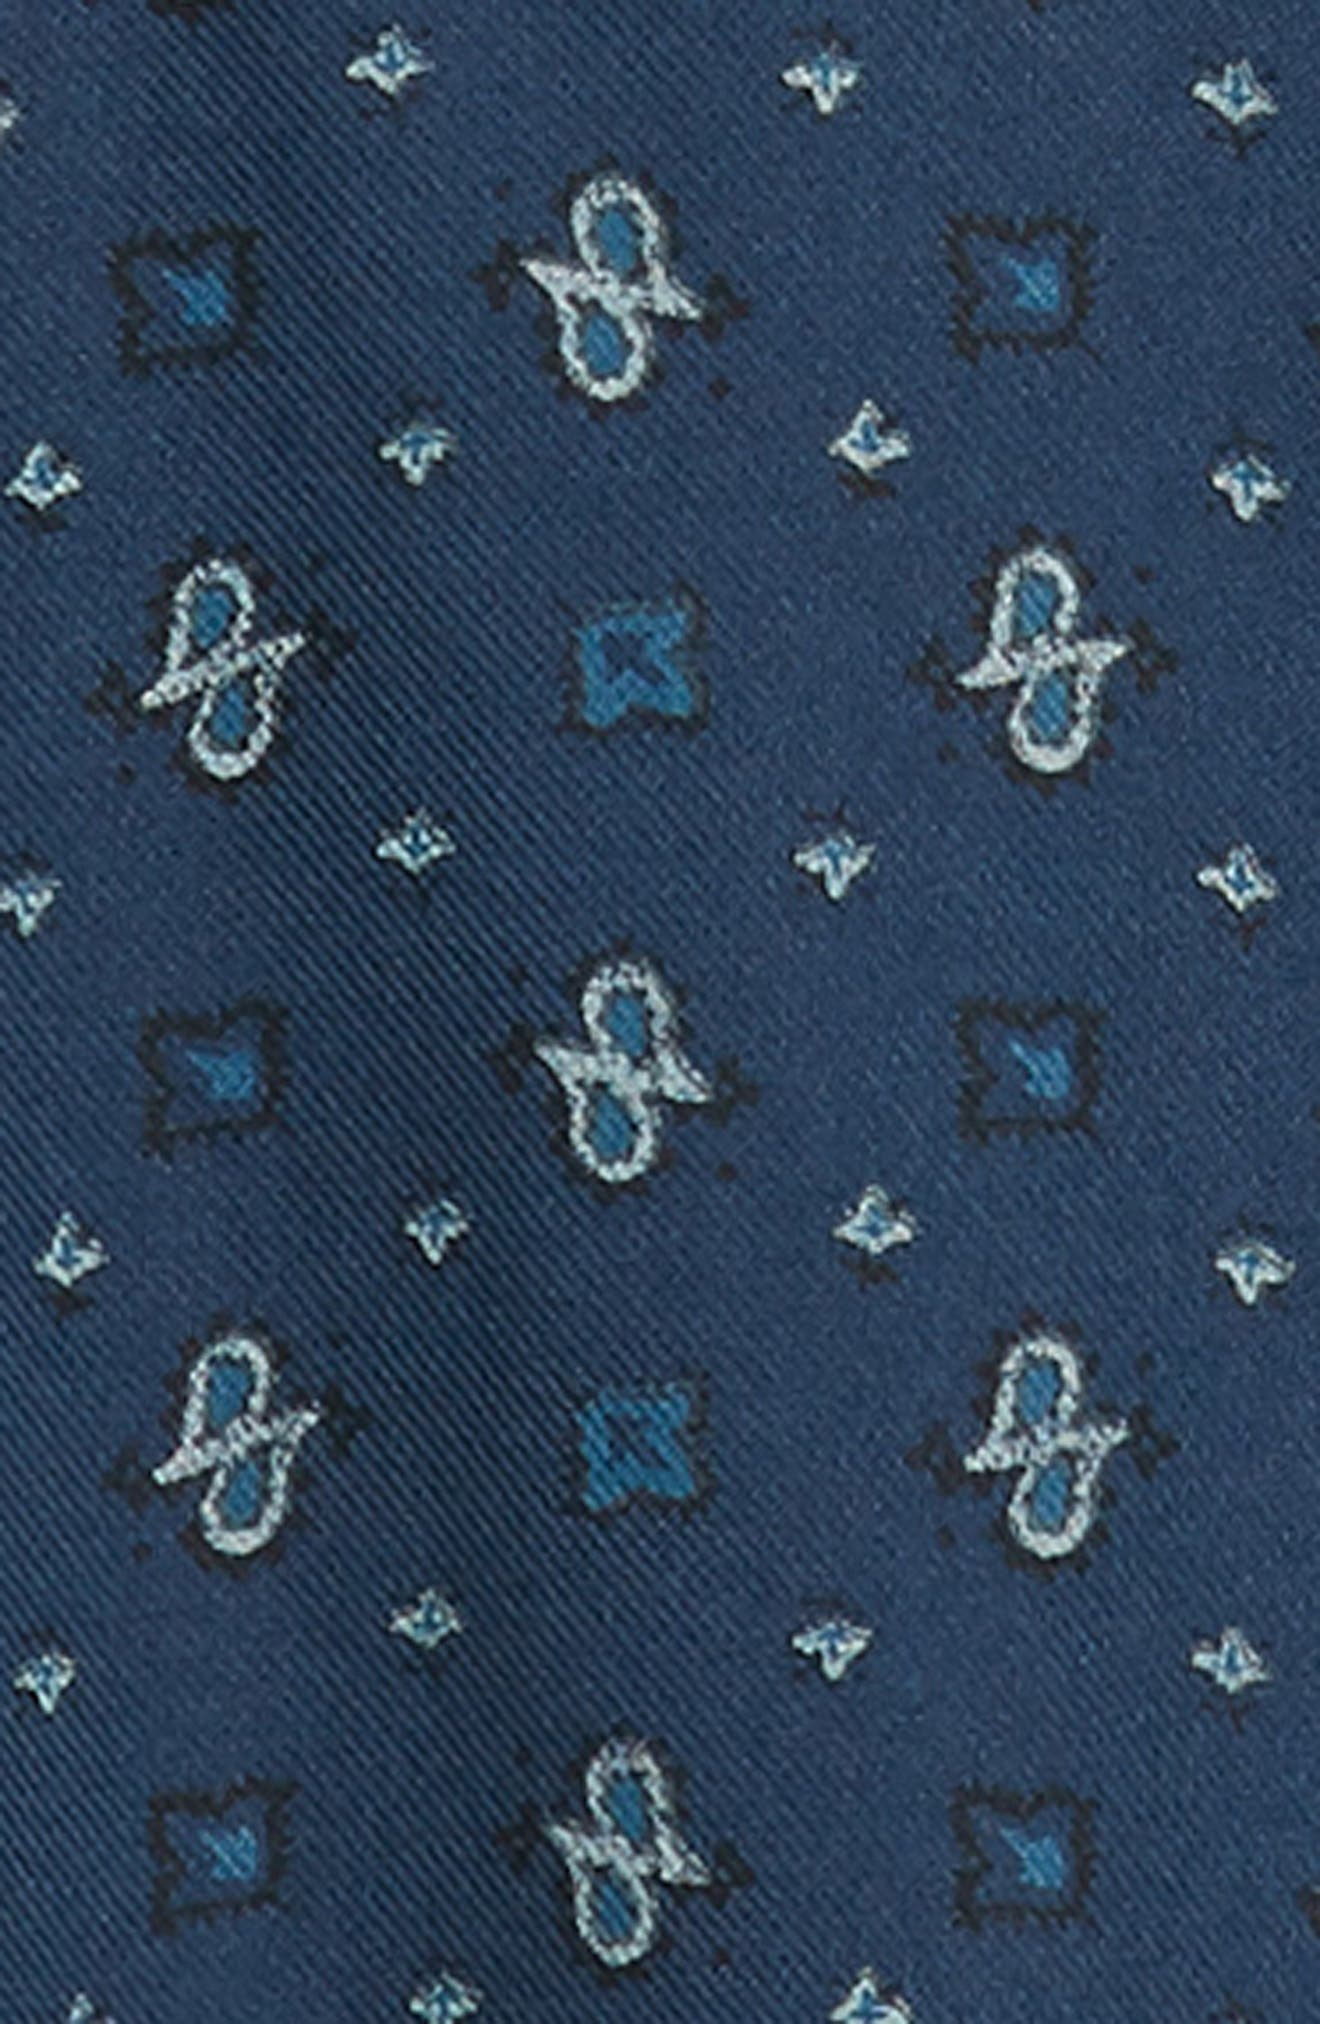 Regular Fit Paisley Western Shirt,                             Alternate thumbnail 6, color,                             BLUE CASPIA DESERT PAISLEY